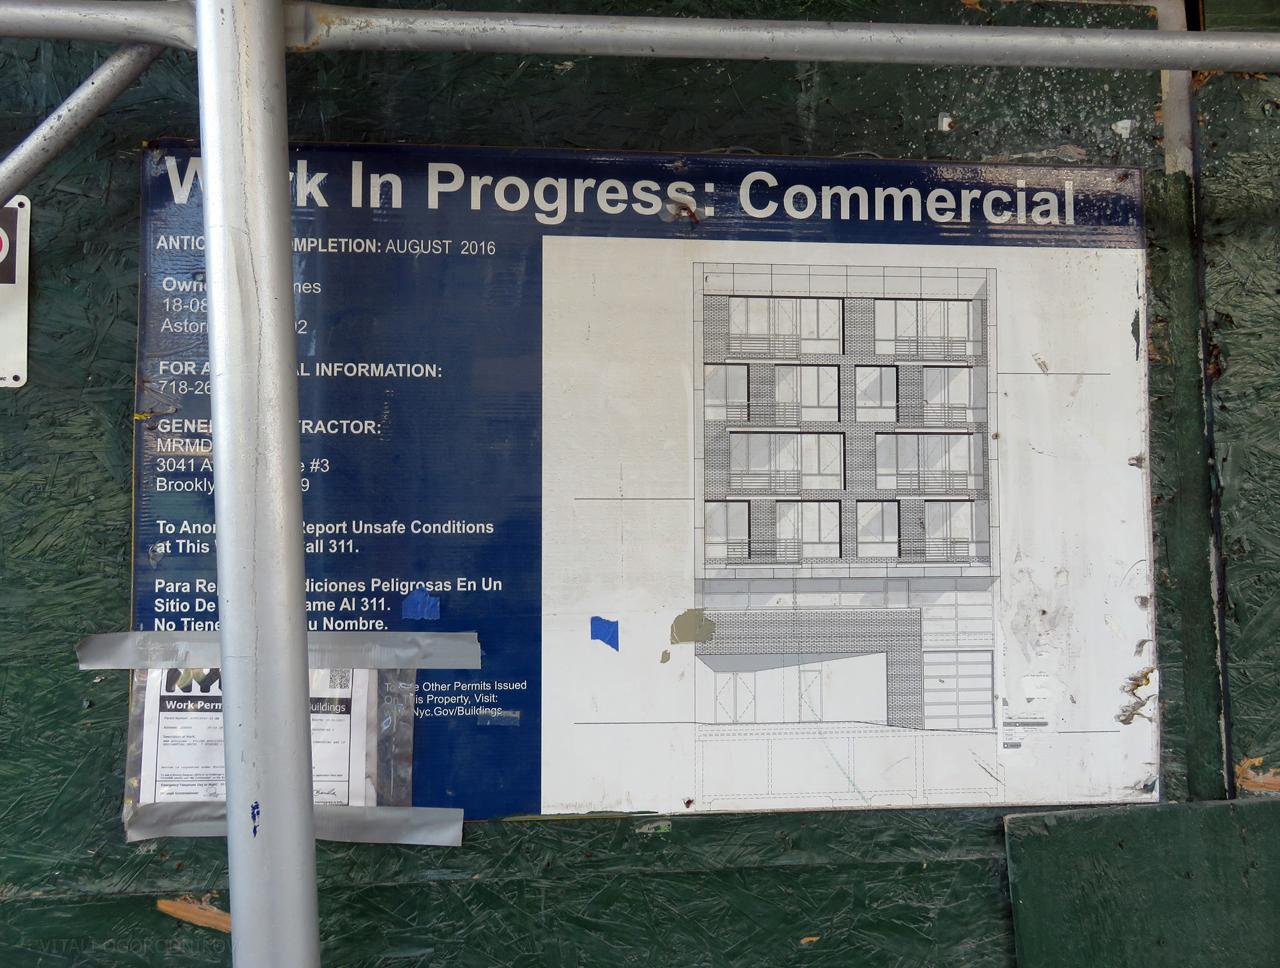 IMG_9961-25-10-38th-Avenue-UC-board-small-wmark